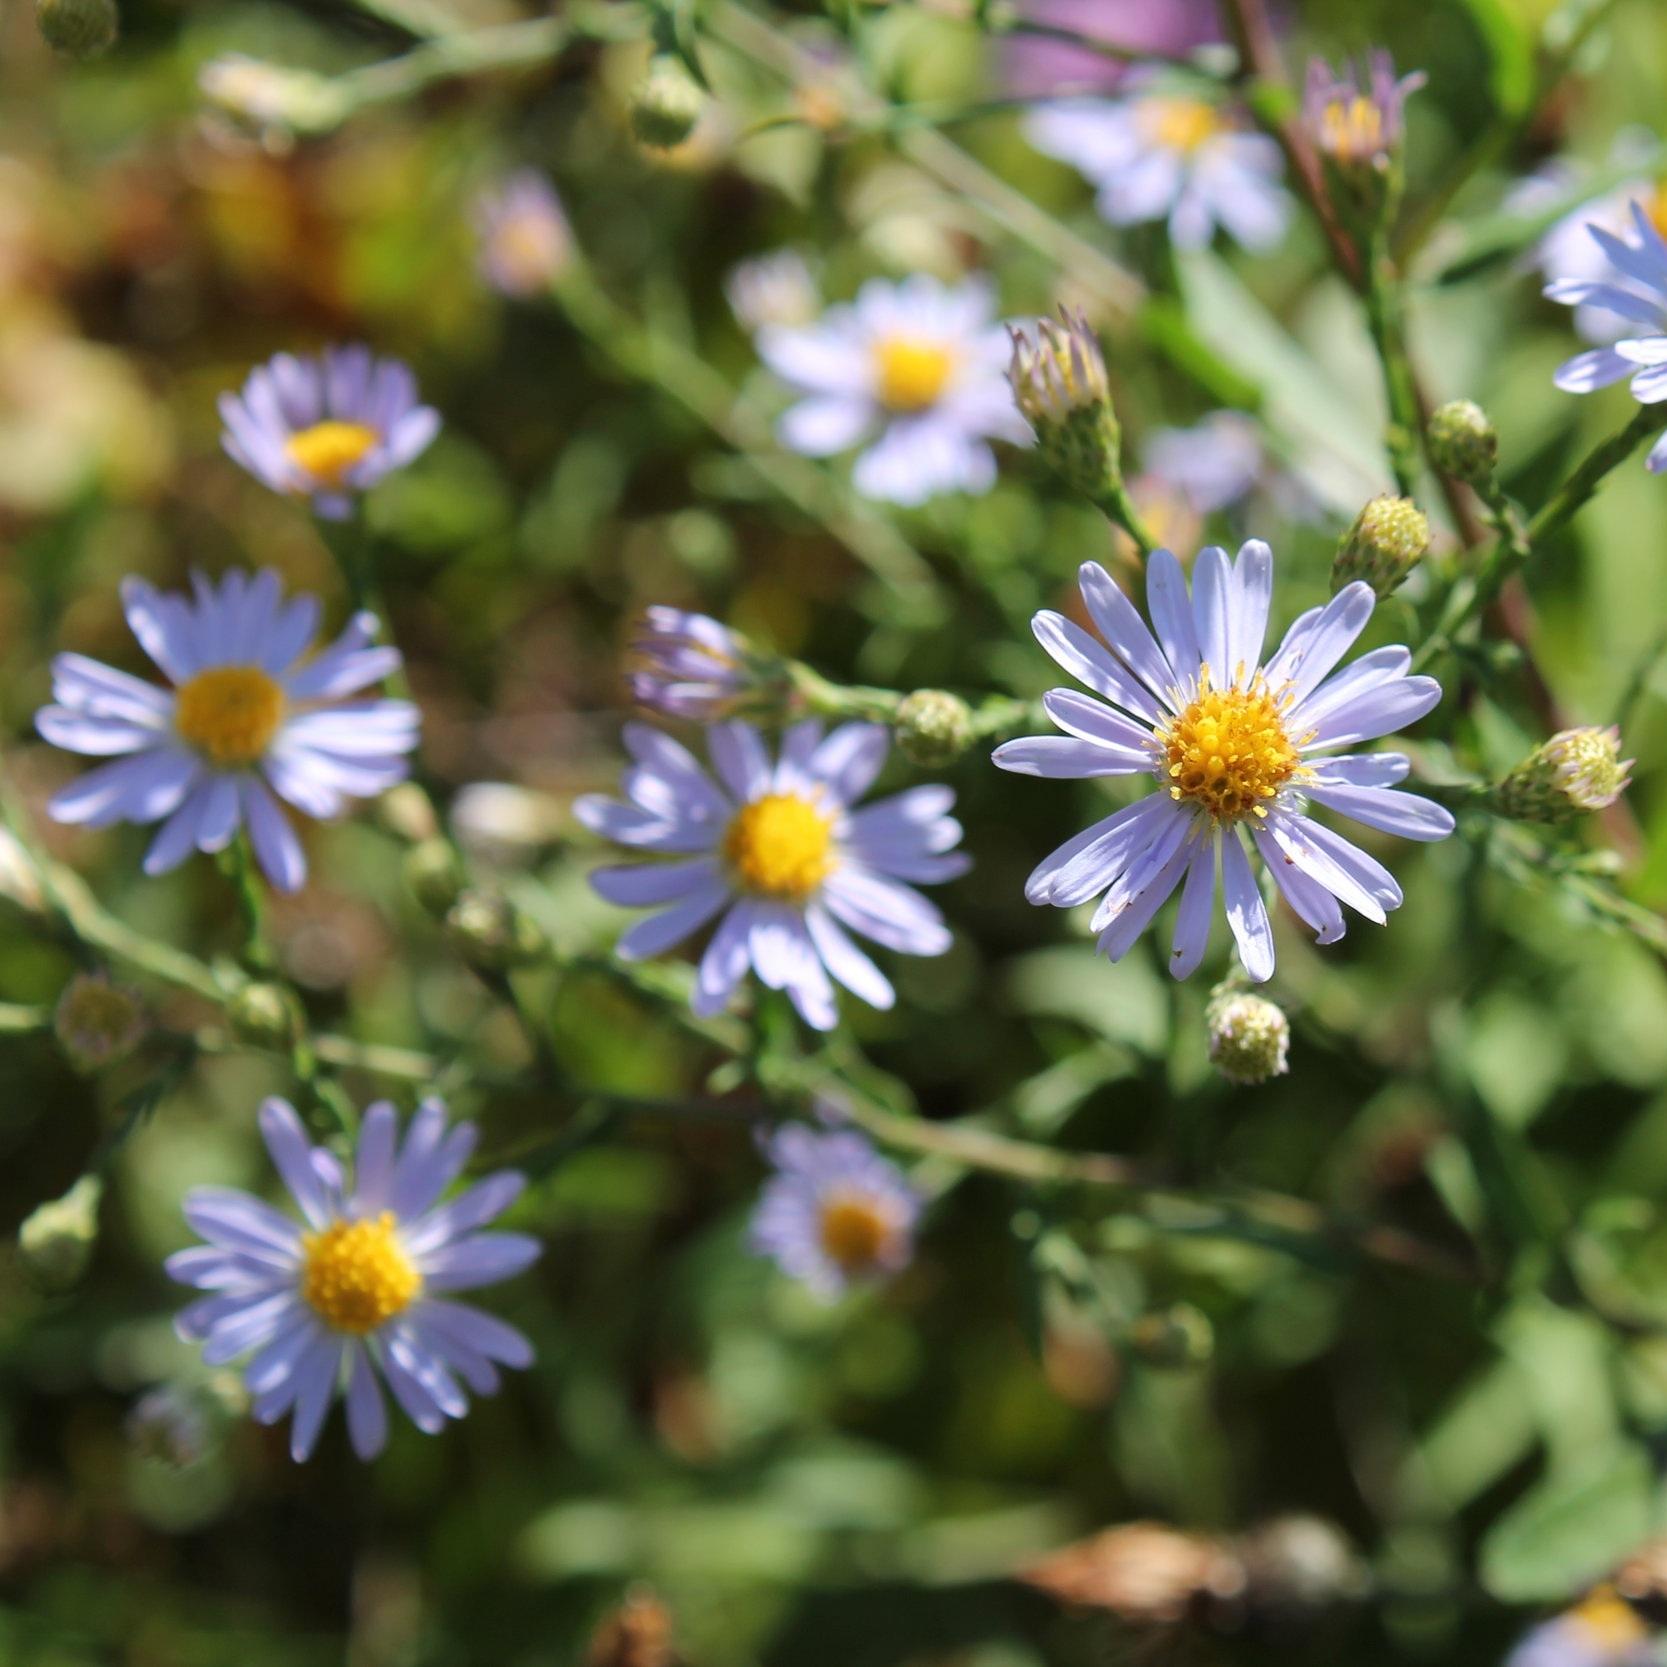 Symphyotrichum laeve (Smooth blue aster) 2.jpg